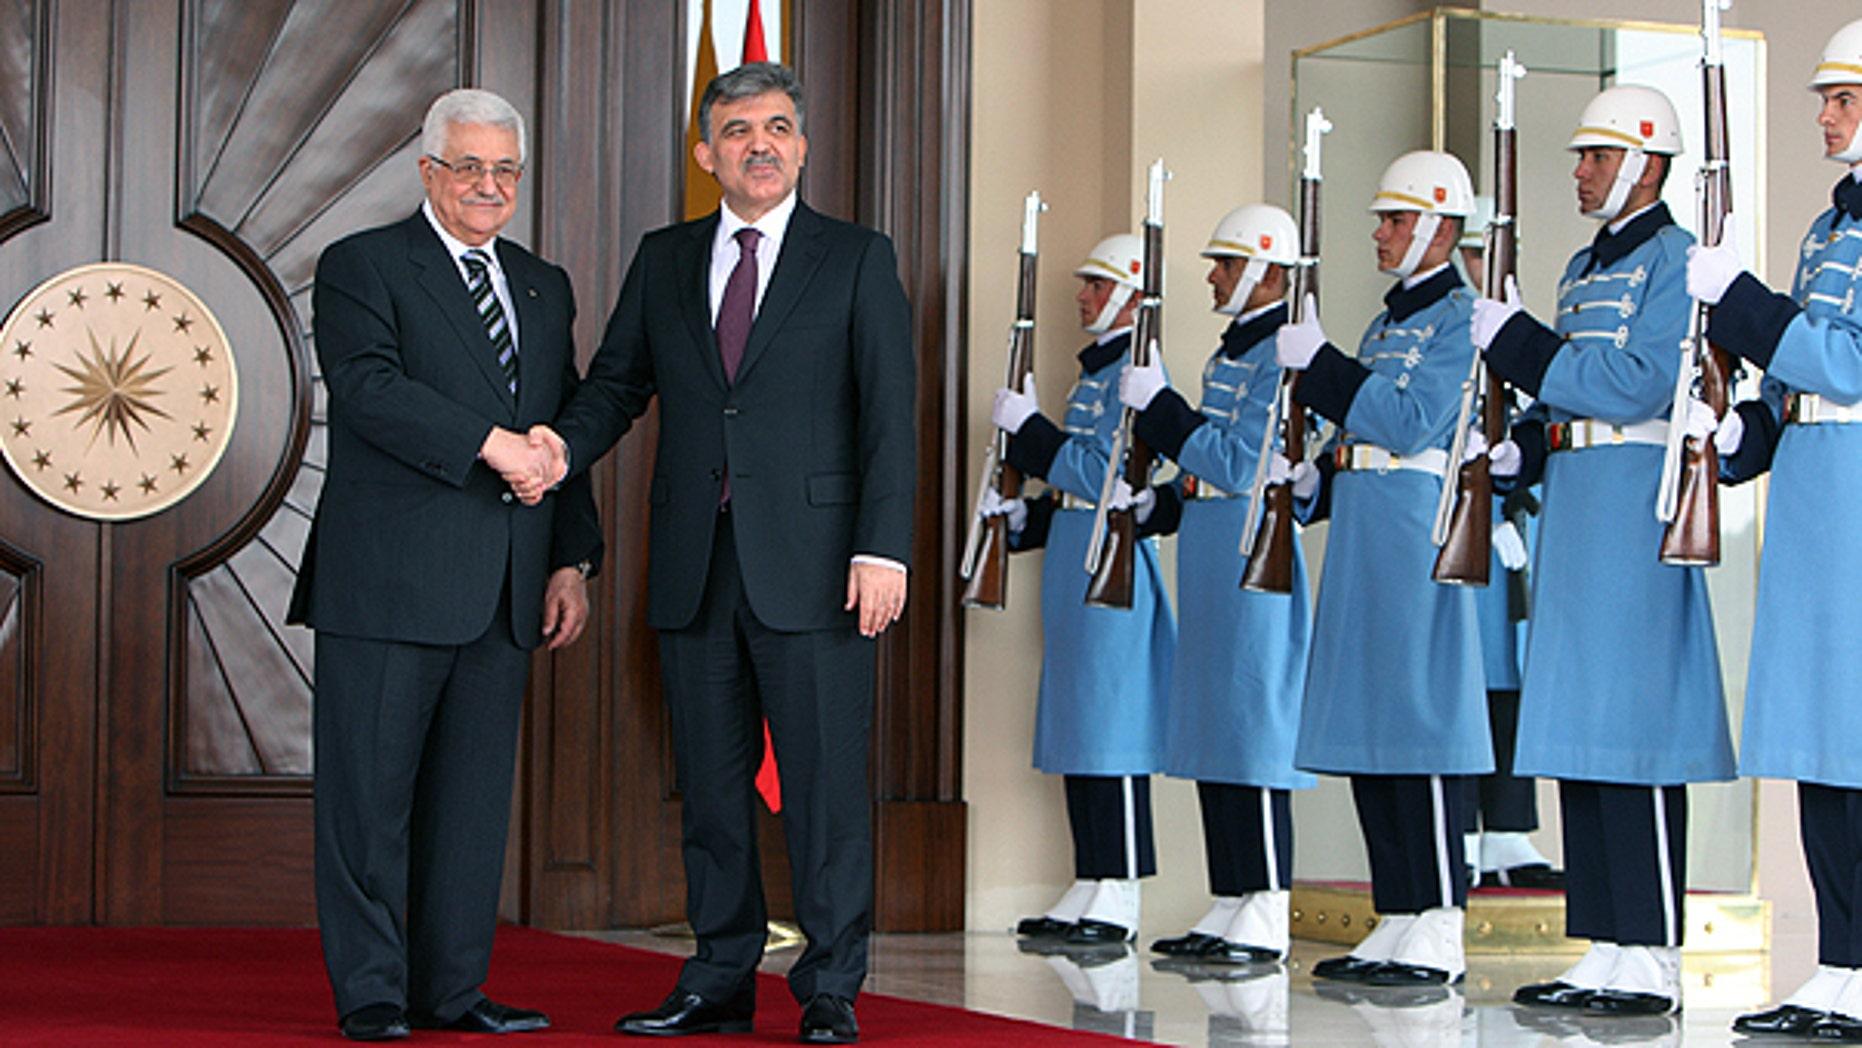 Palestinian leader Mahmoud Abbas, left, and Turkish President Abdullah Gul pose for media cameras before their meeting at the Cankaya Palace in Ankara, Turkey.